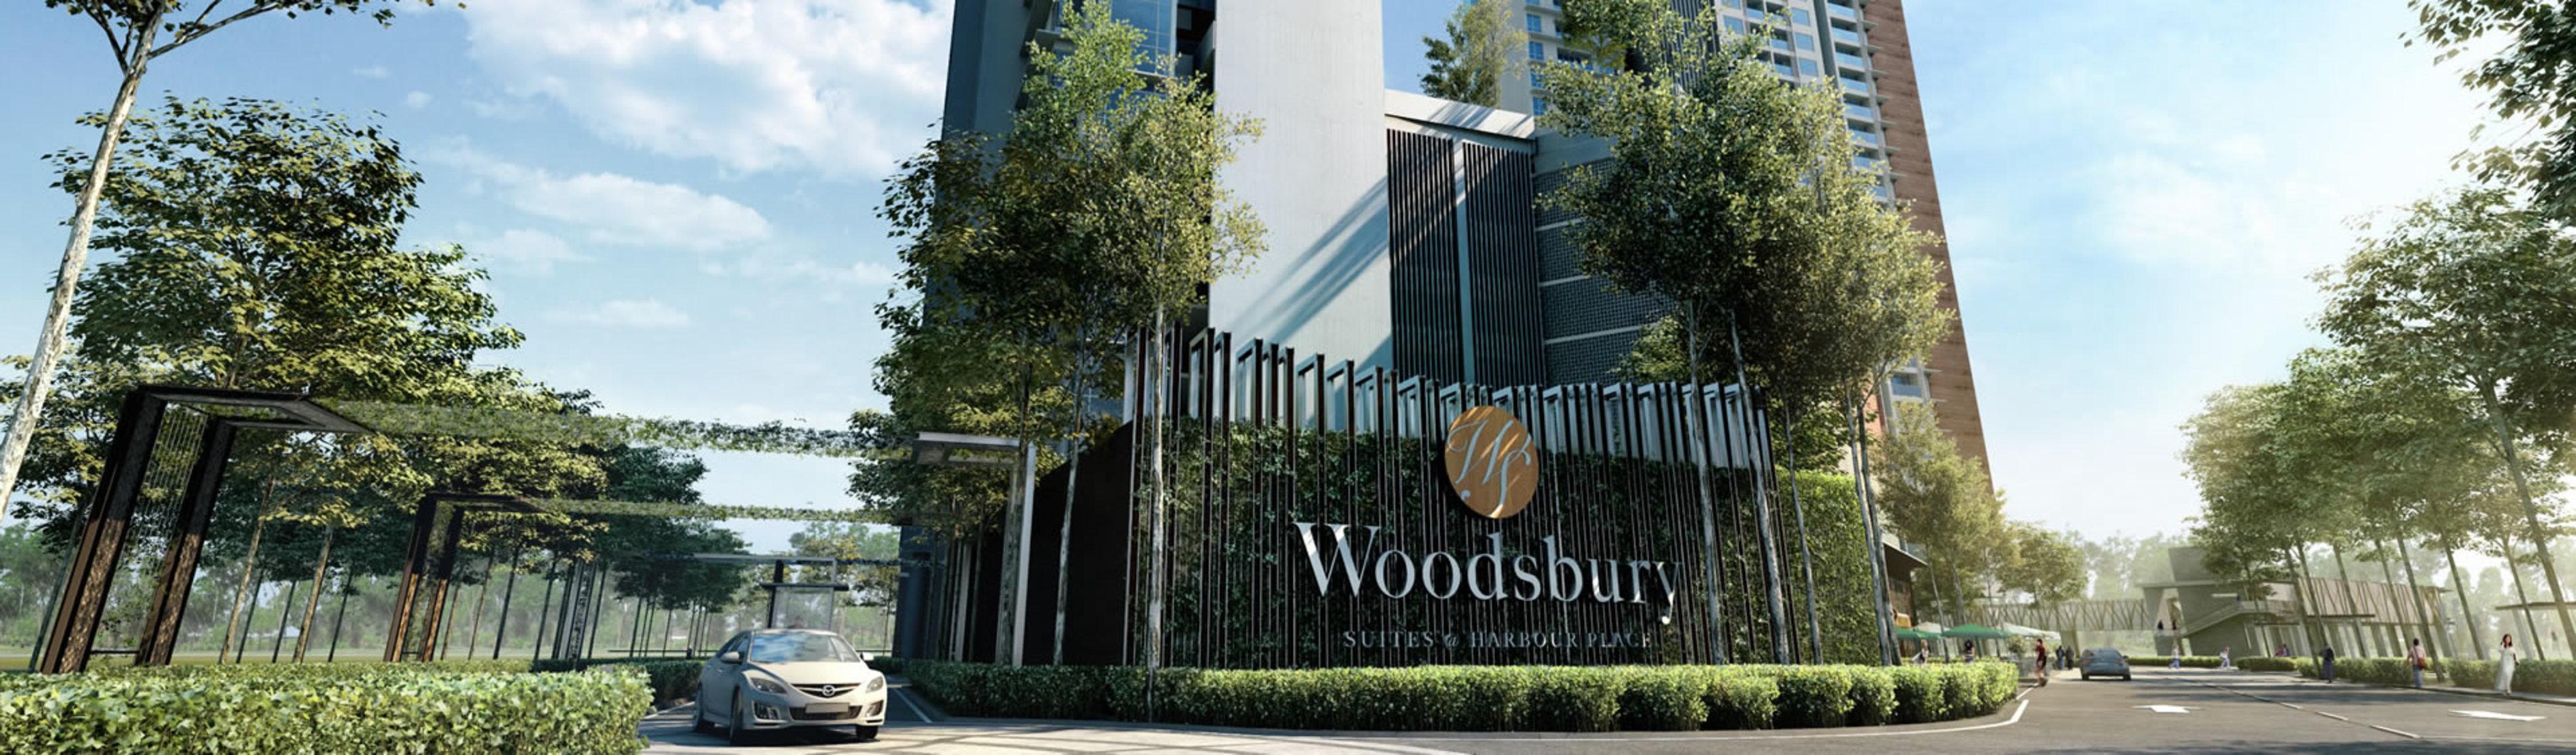 Woodsbury suites video propsocial